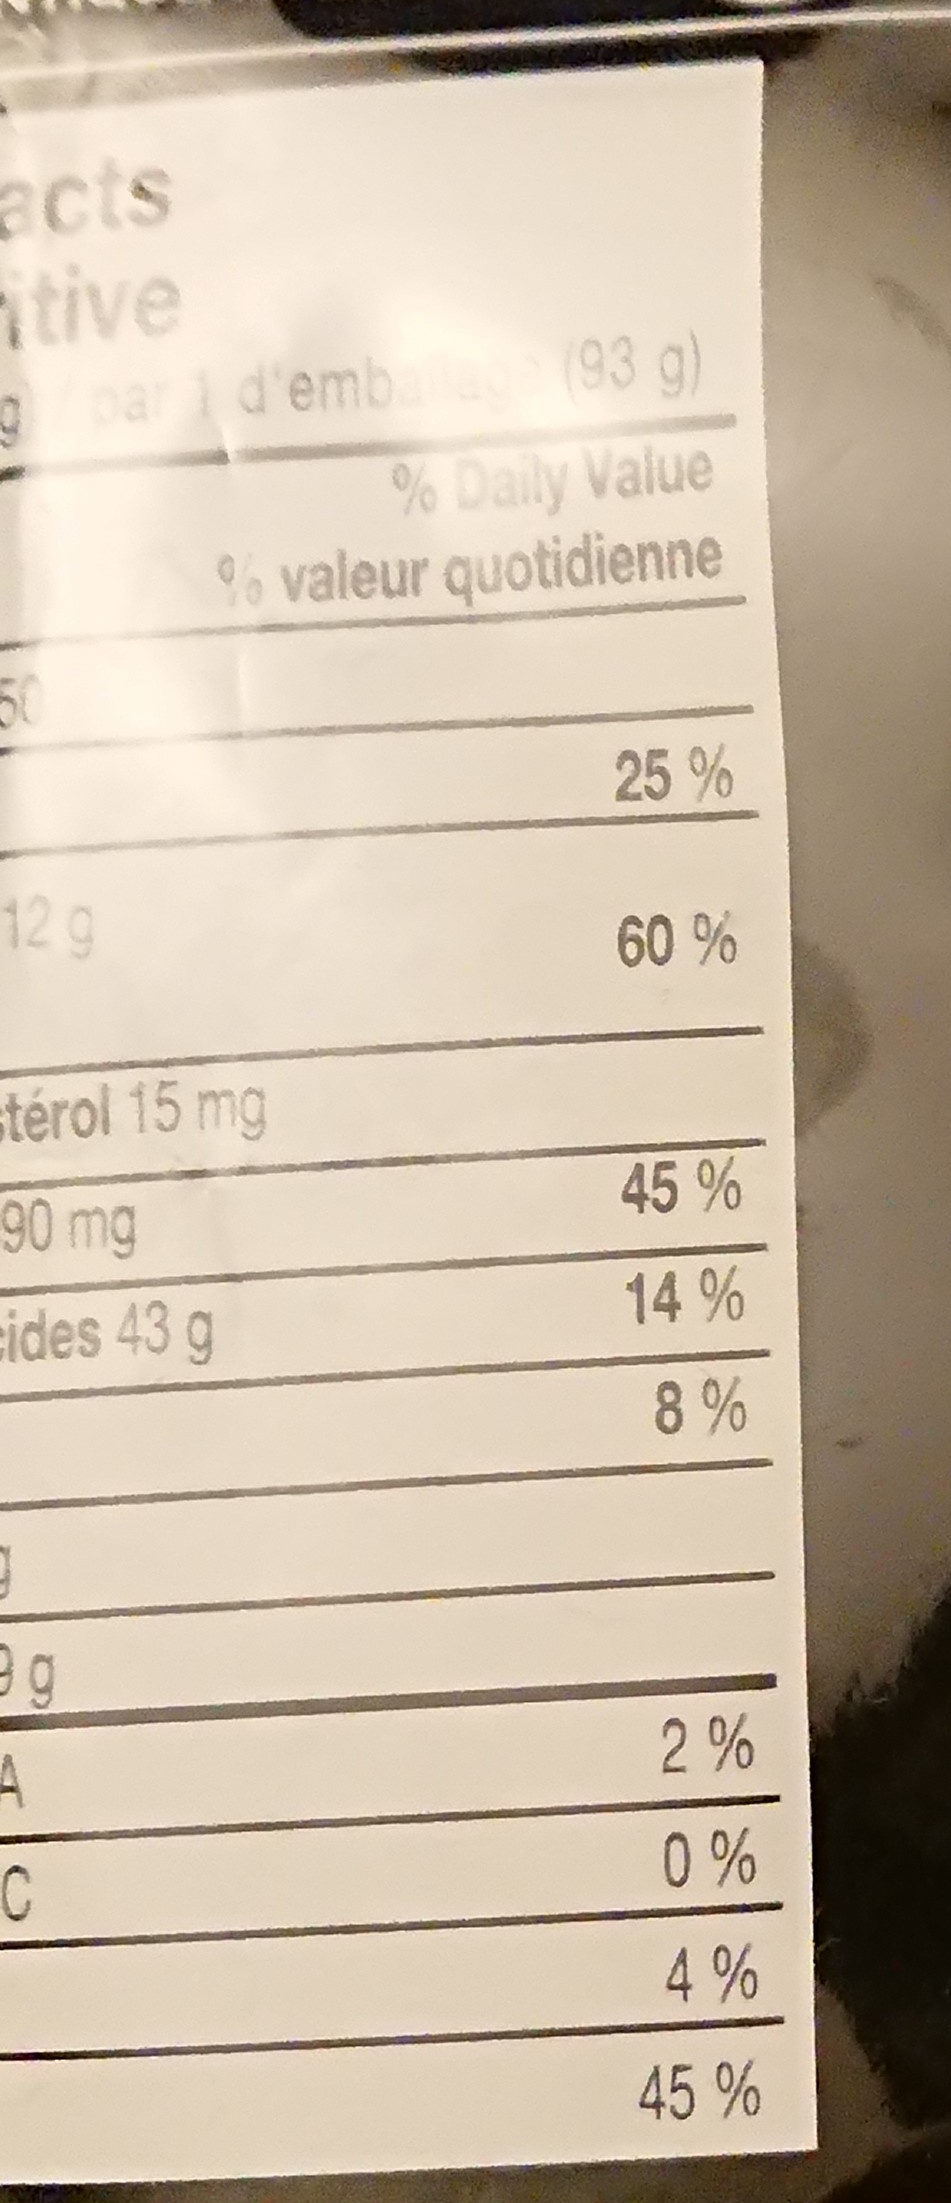 Prima Taste - Noodle - Nutrition facts